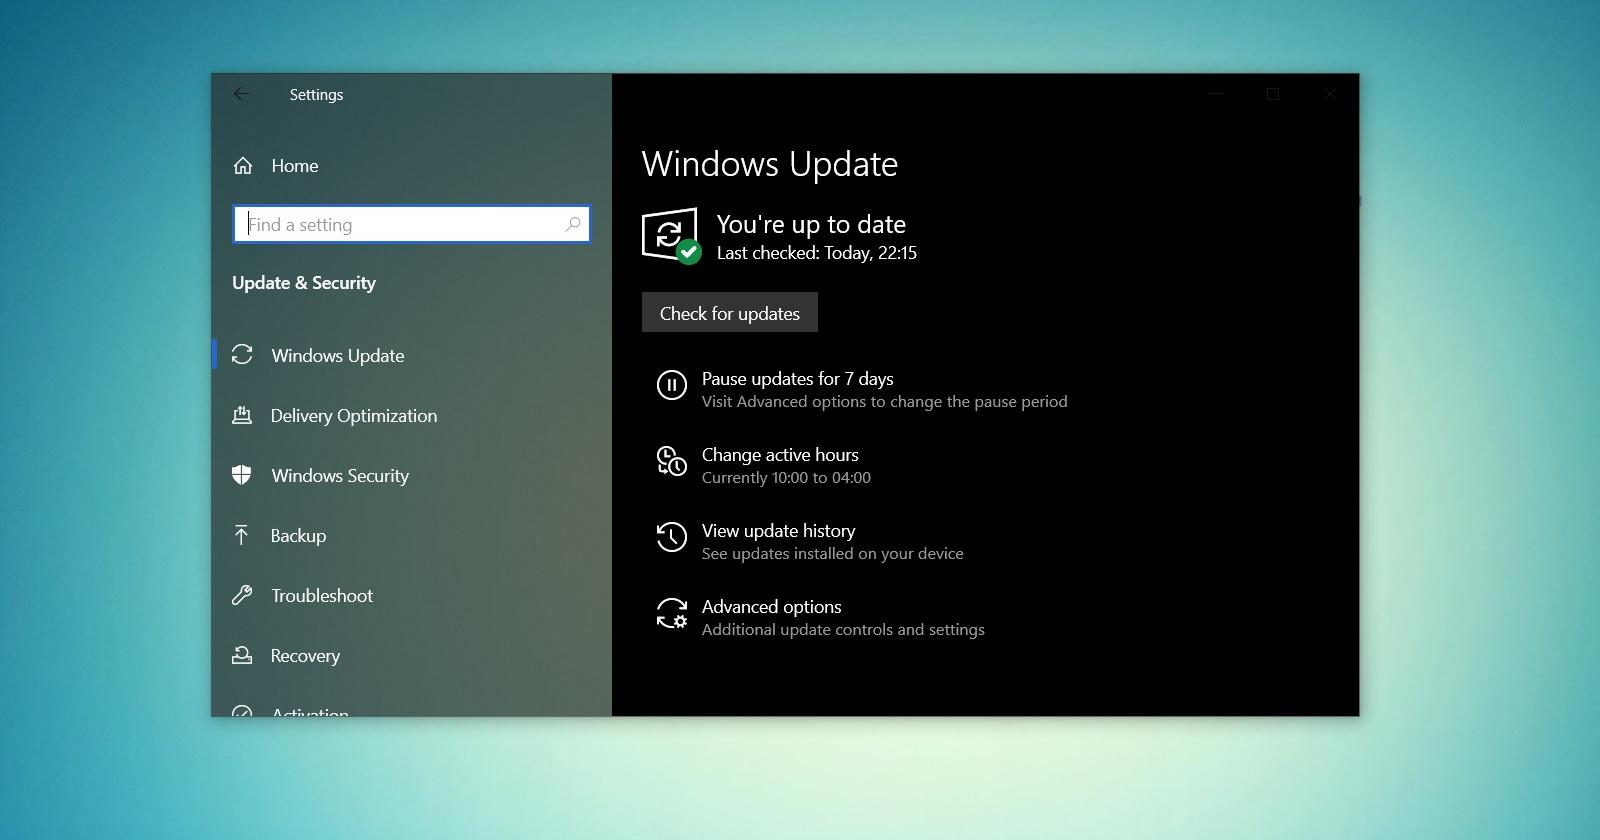 Download Windows 10 October 2020 Update Iso Images